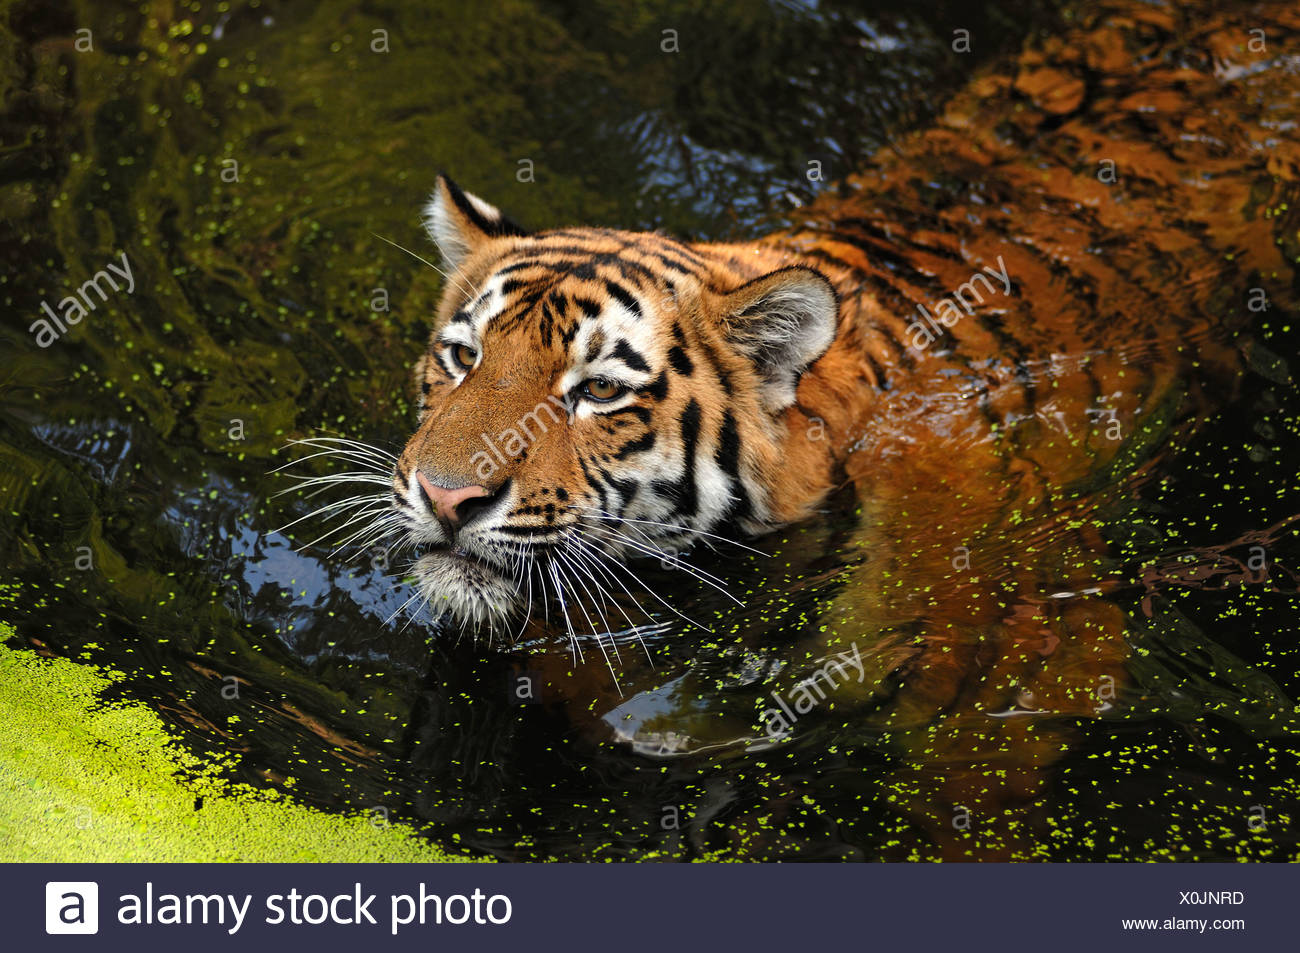 Siberian Tiger (Panthera tigris altaica), swimming in a moat, Tiergarten Nuernberg, Nuremburg Zoo, Nuremburg, Middle Franconia - Stock Image